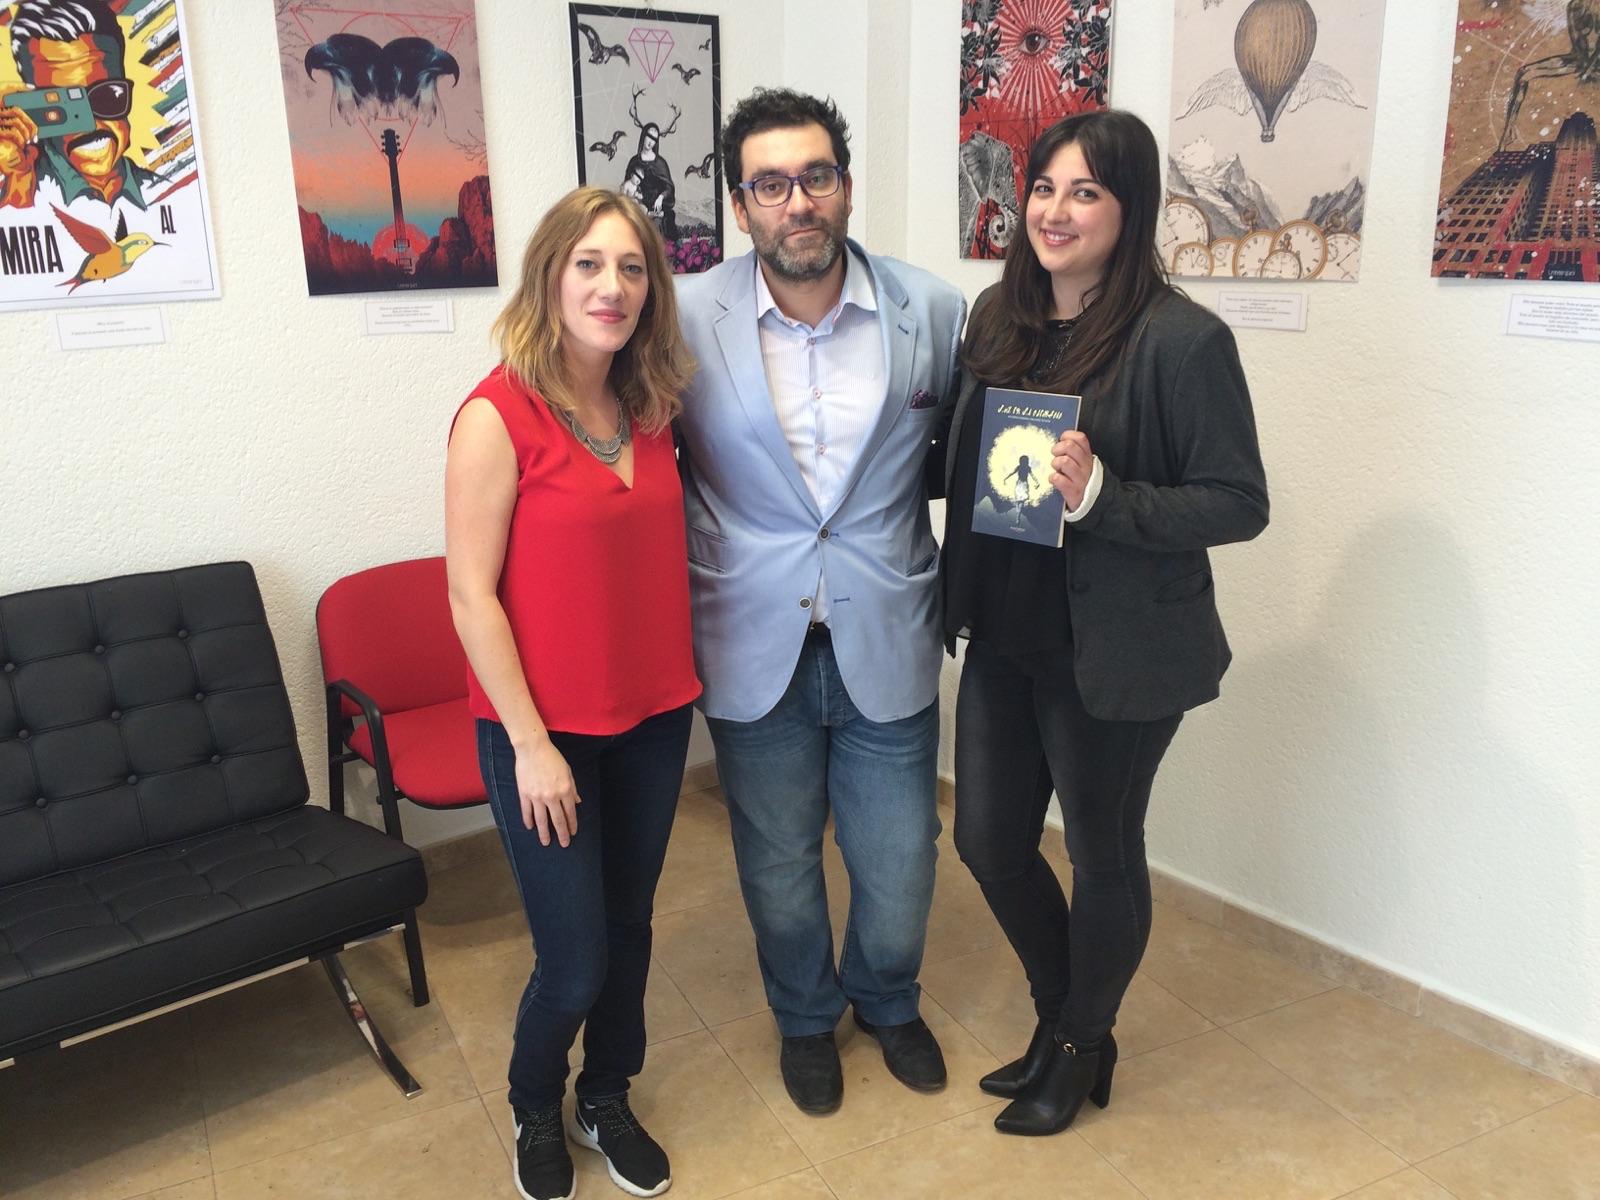 Inauguración de exposición y presentación de un libro en León Domínguez & Asociados